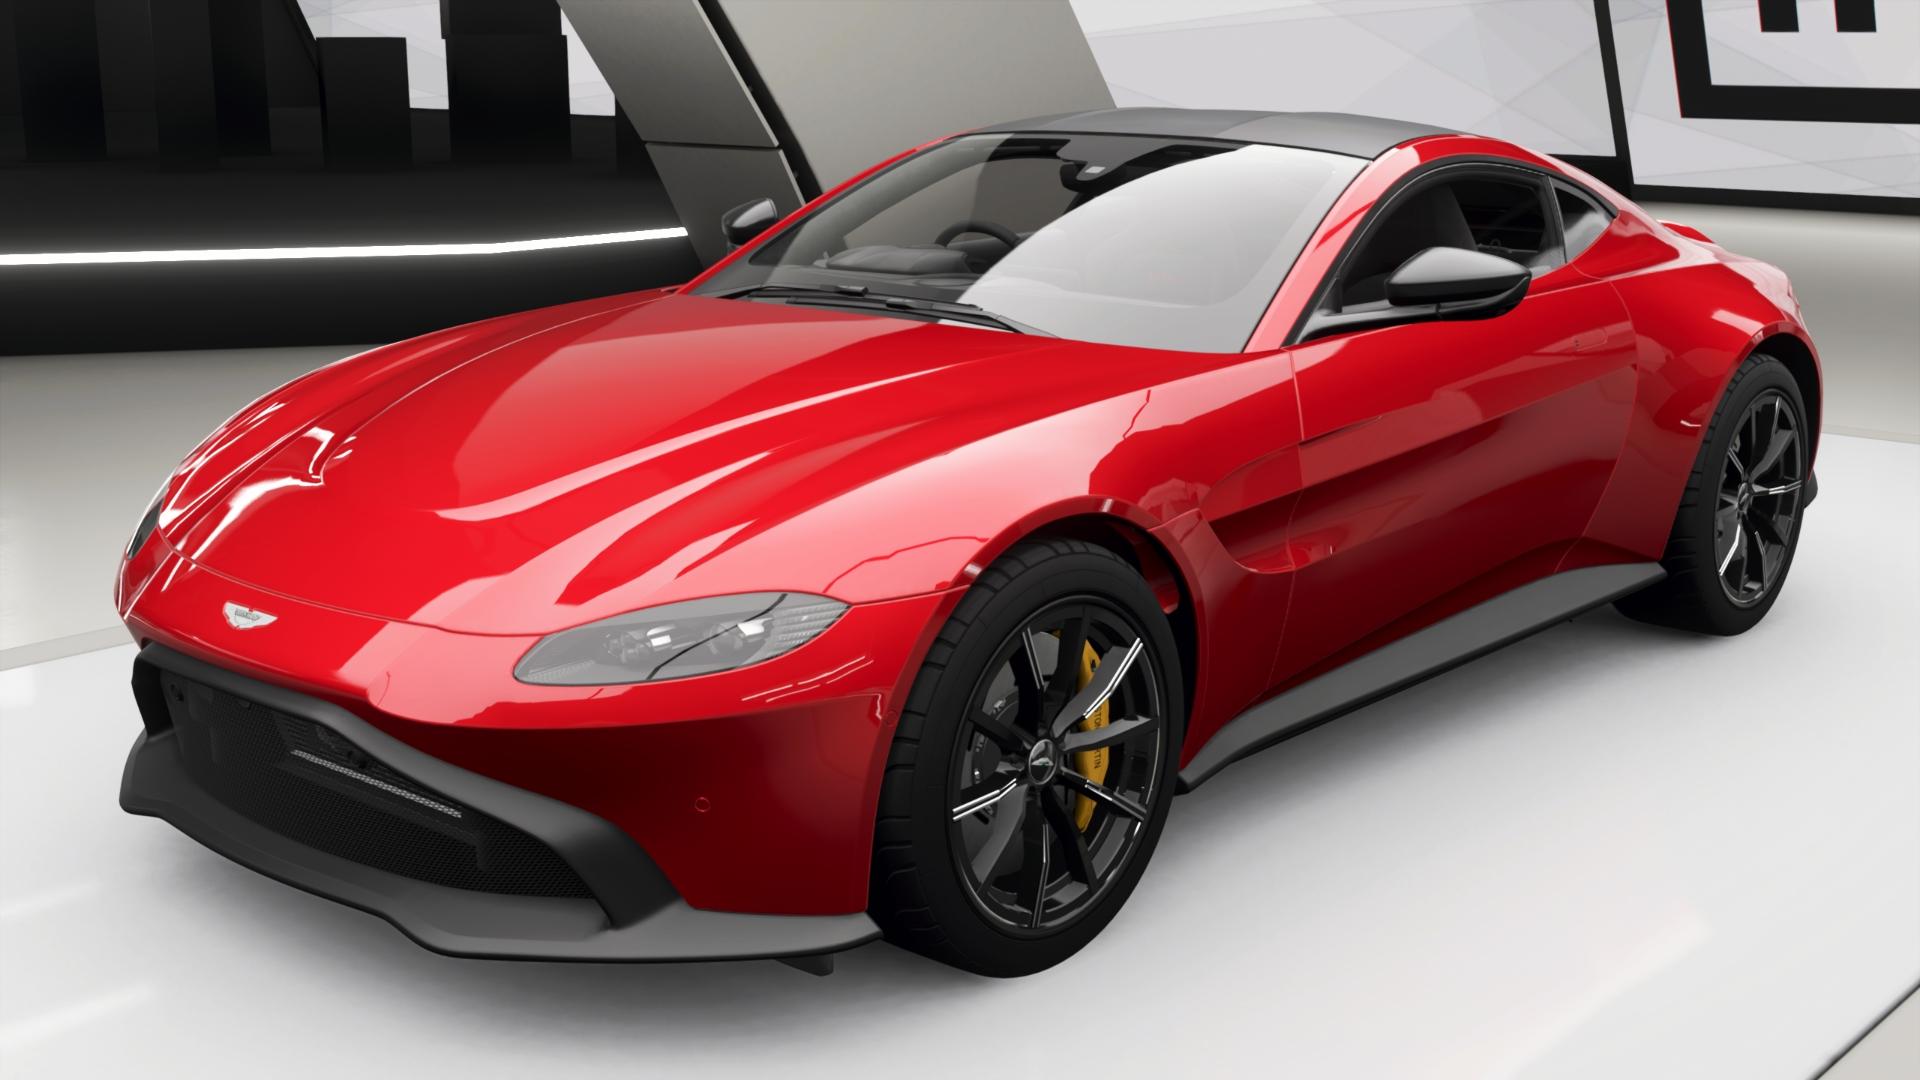 Aston Martin Vantage   Forza Motorsport Wiki   FANDOM powered by Wikia